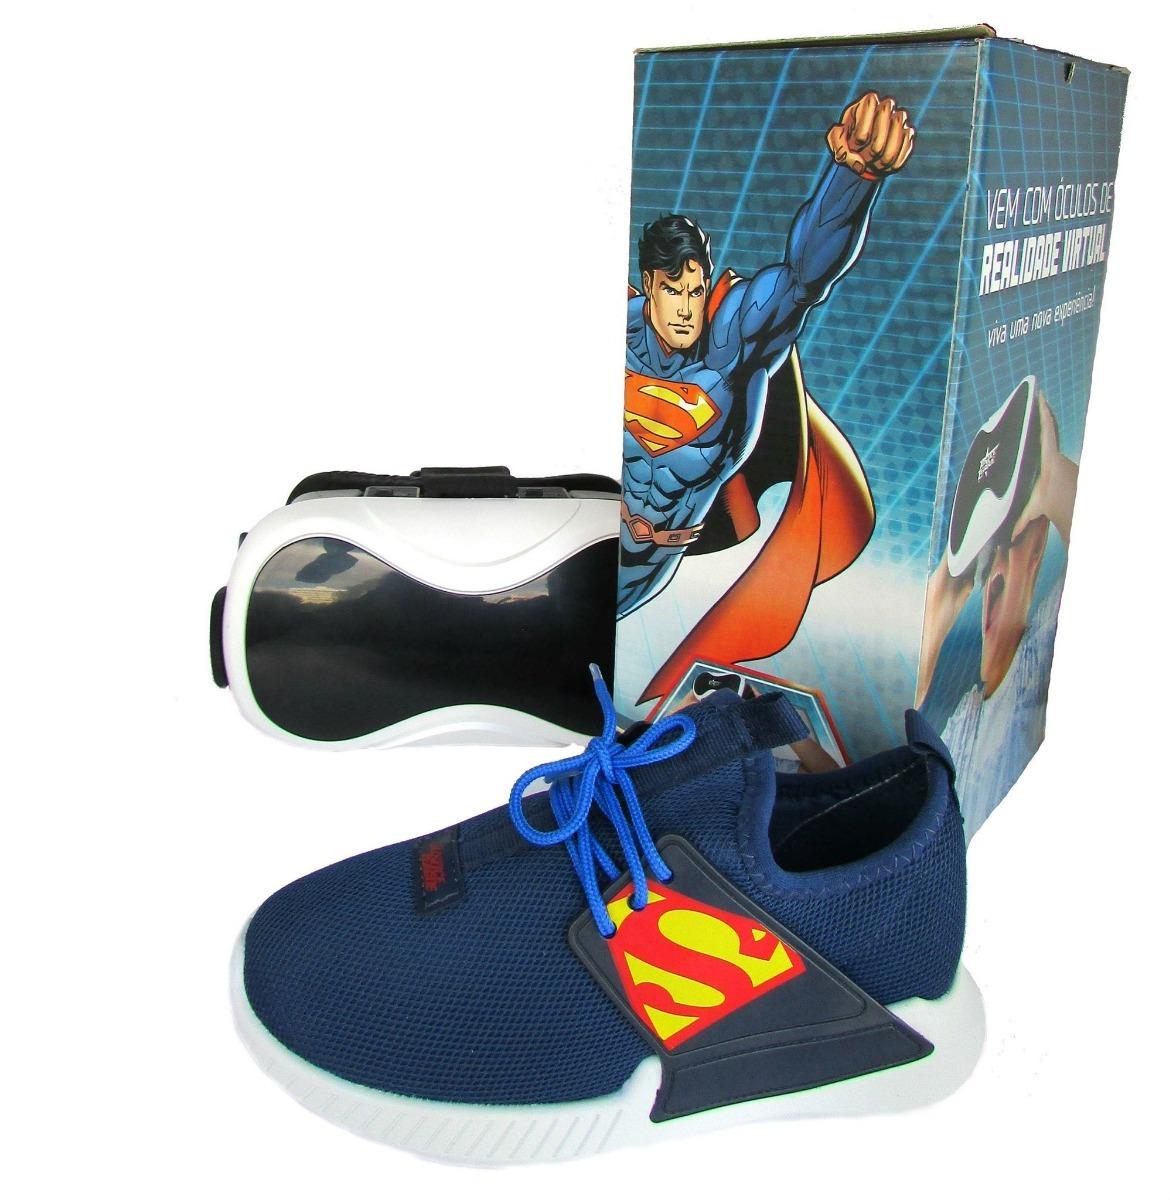 15bb0969d91 tênis infantil superman liga justiça herói realidade virtual. Carregando  zoom.